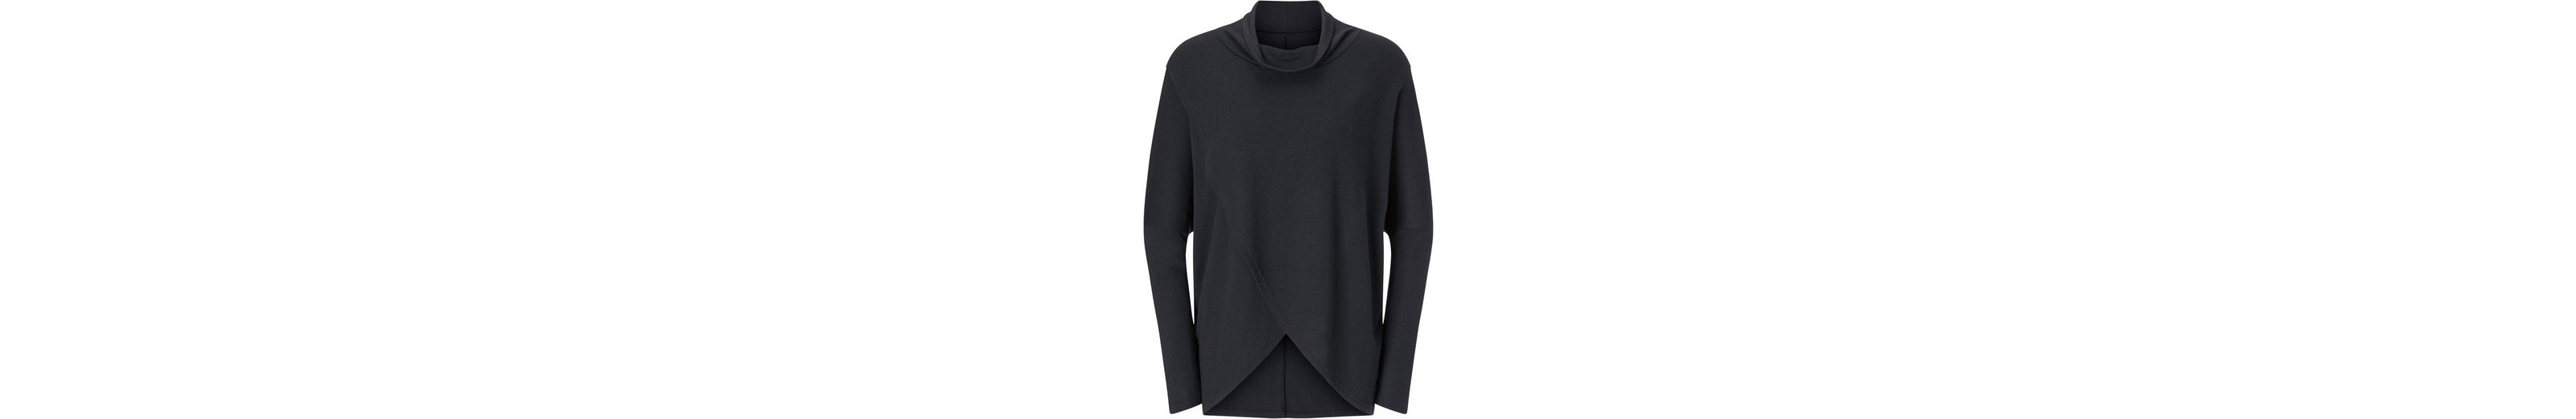 Création L Shirt im Oversized-Look Günstiges Online-Shopping sV0gC